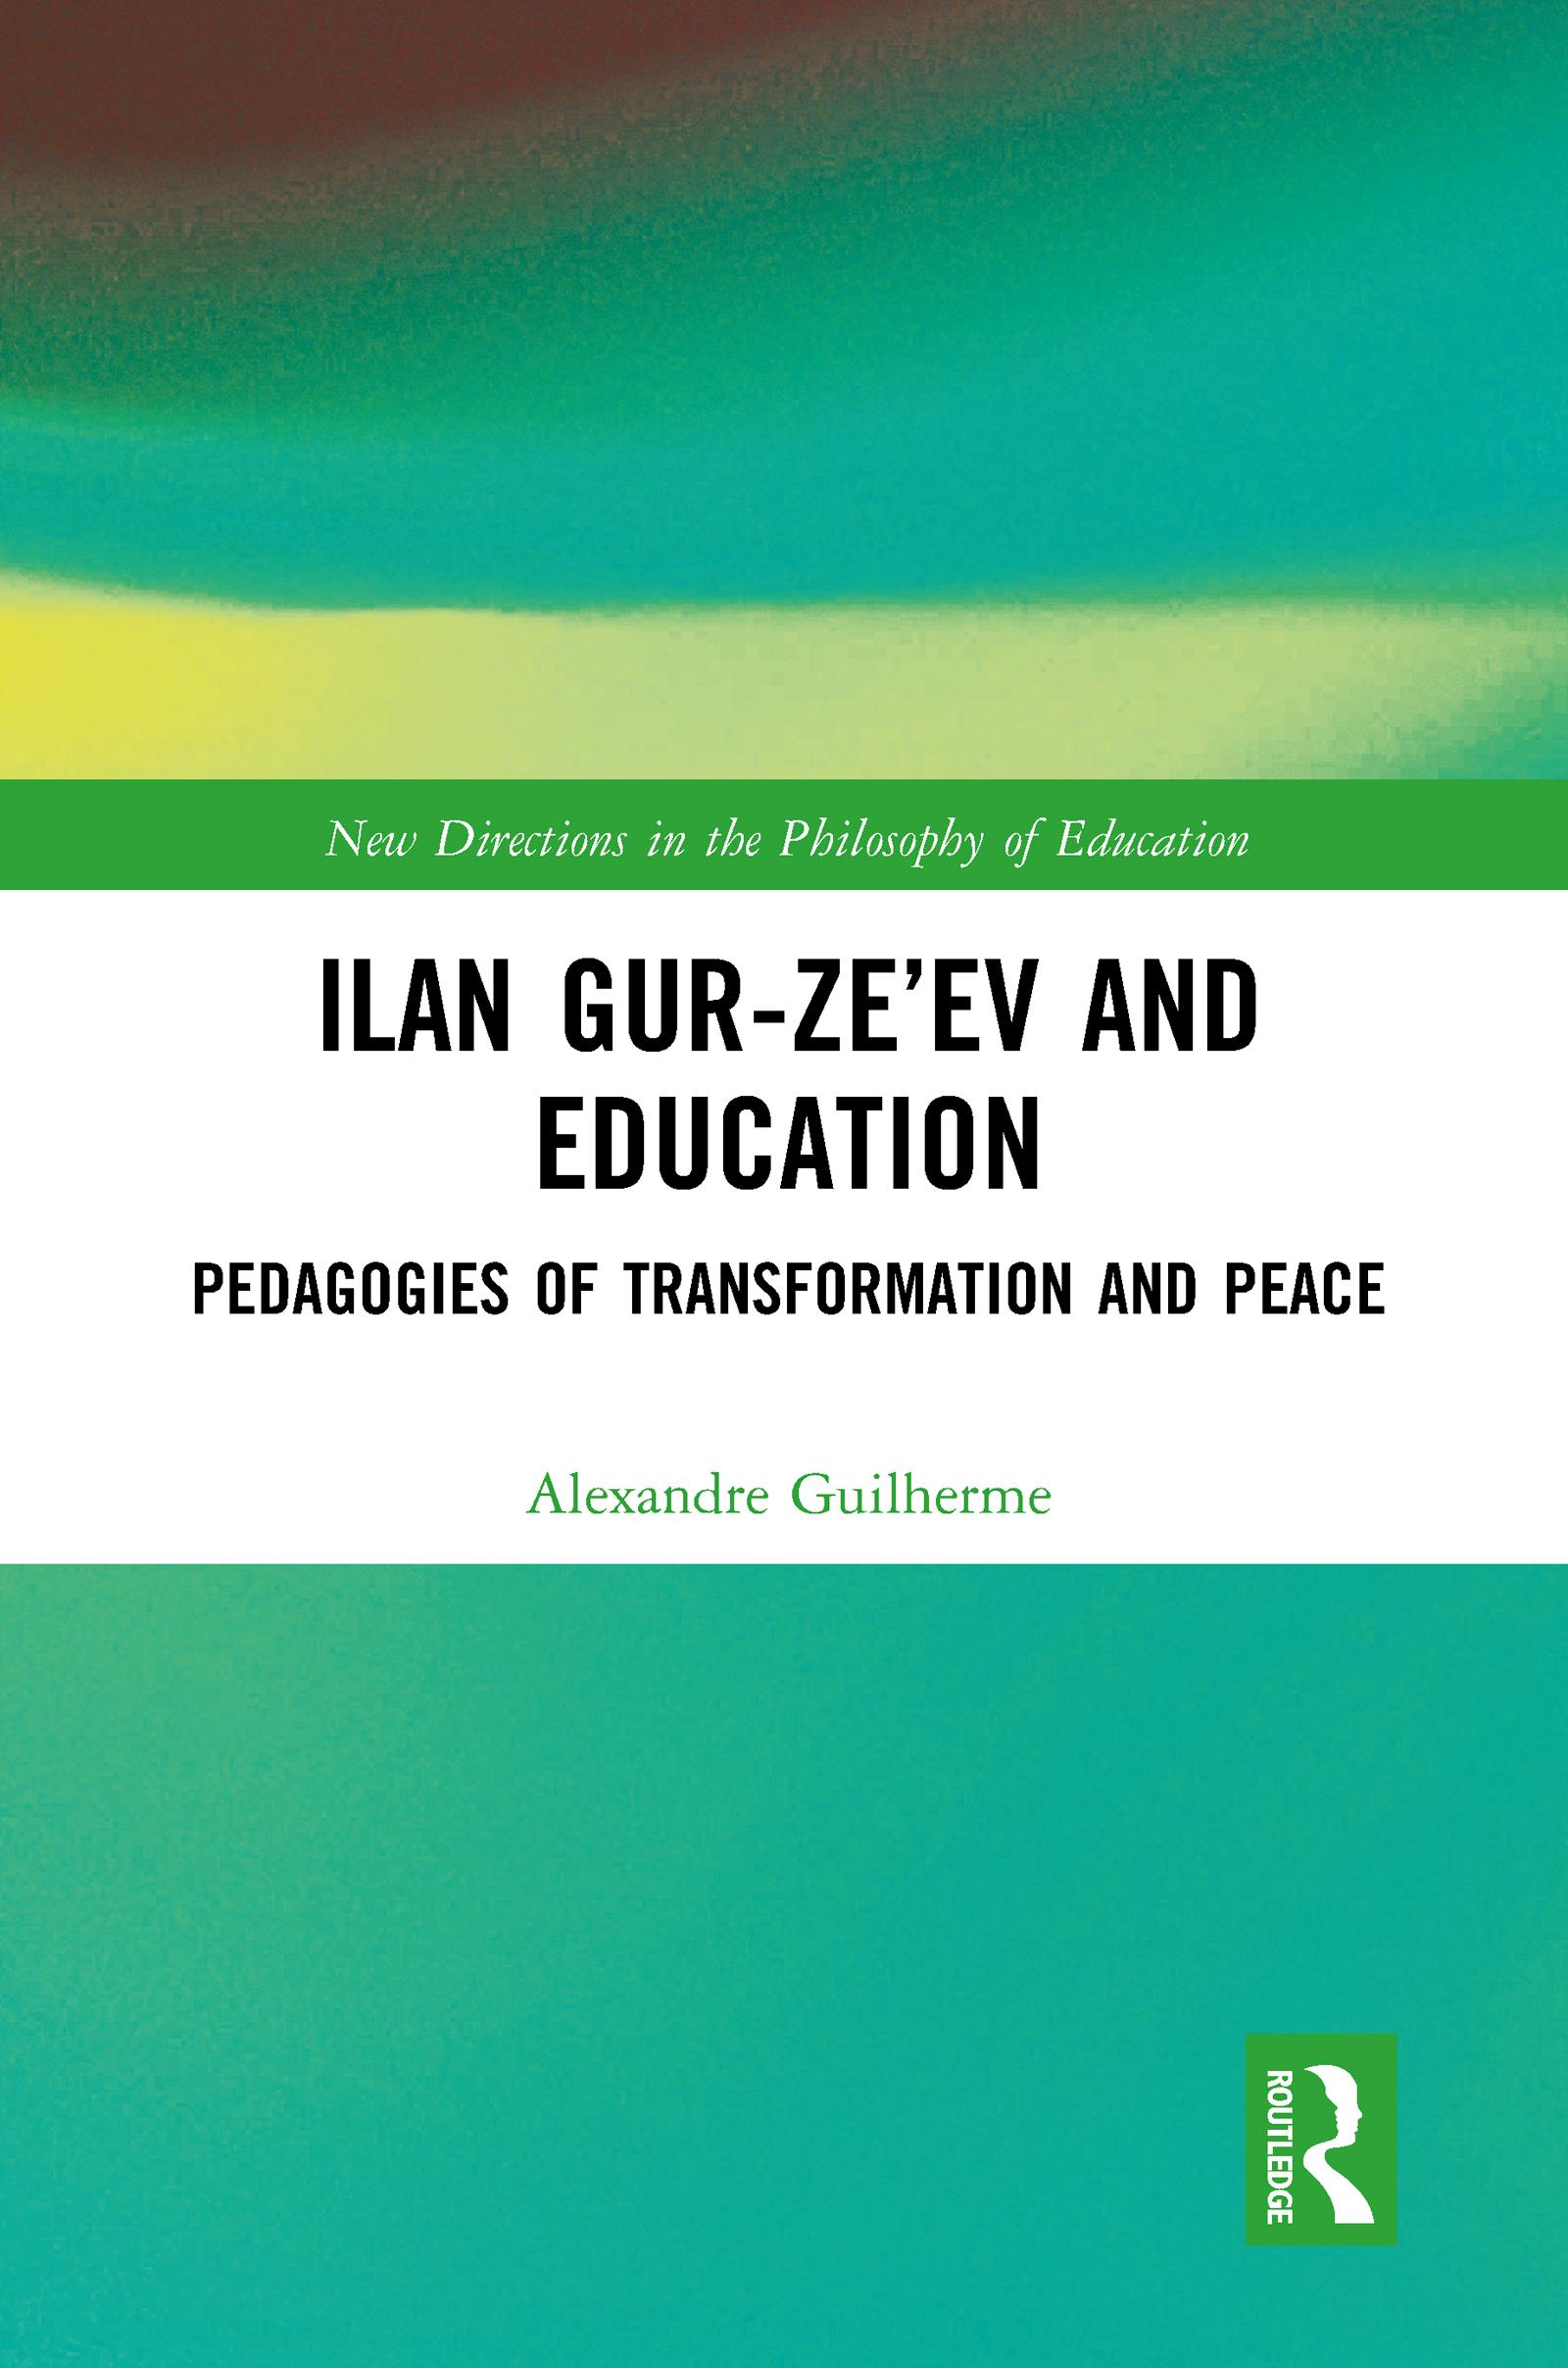 Ilan Gur-Ze'ev and Education